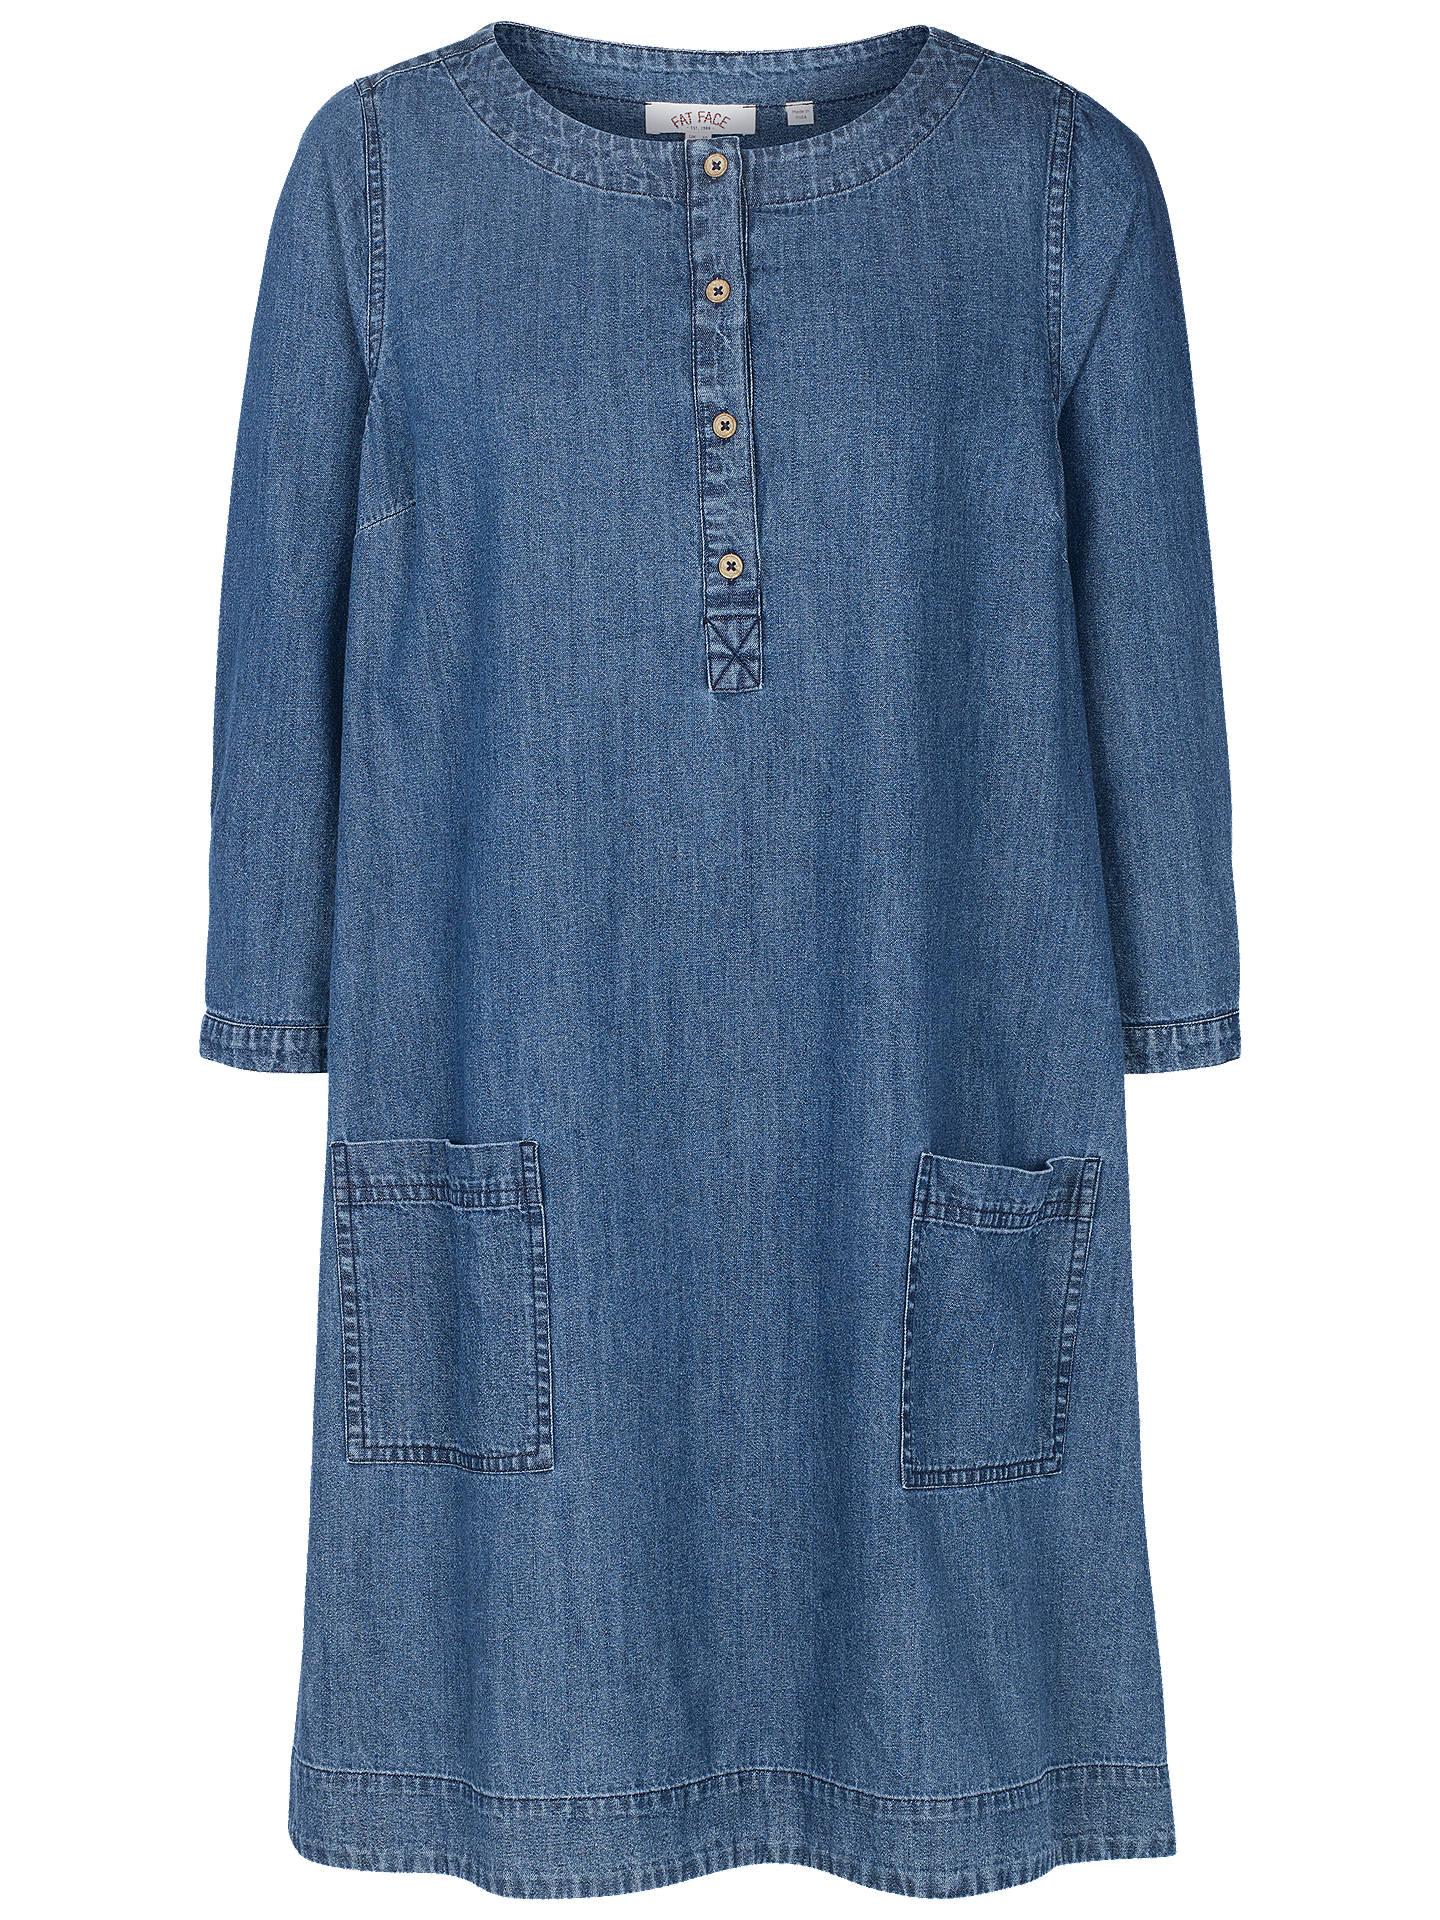 20d367f6183 Buy Fat Face Livvy Chambray Shift Dress